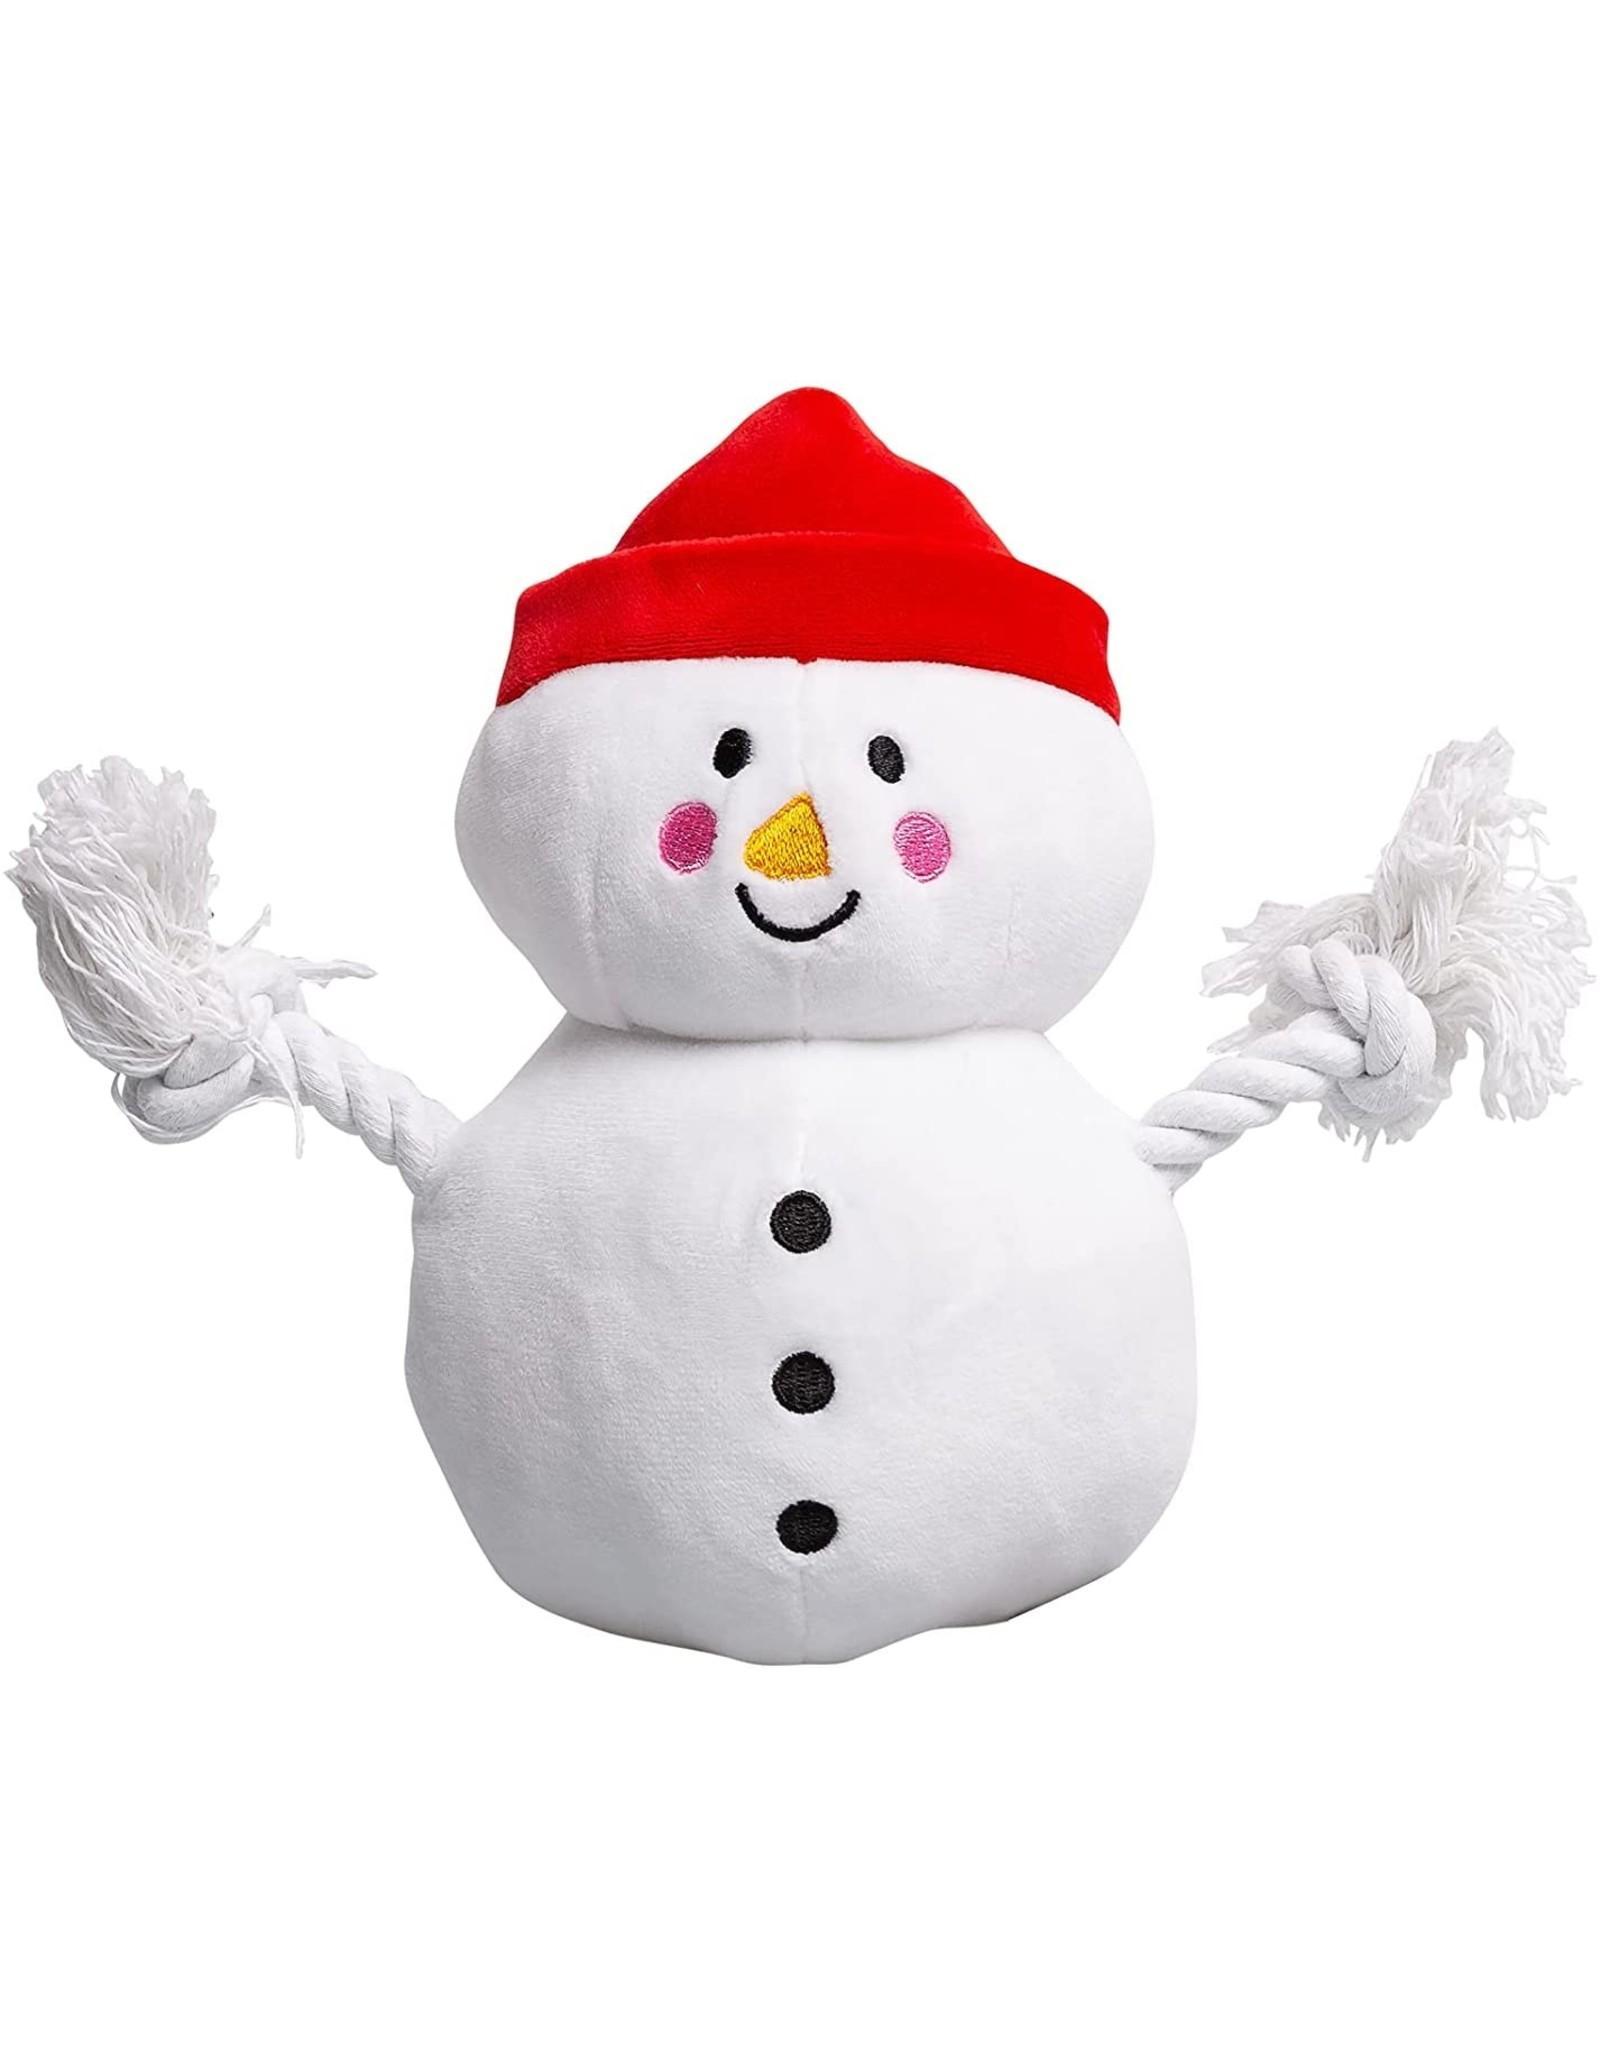 Pearhead Snowman Plush Rope Dog Toy